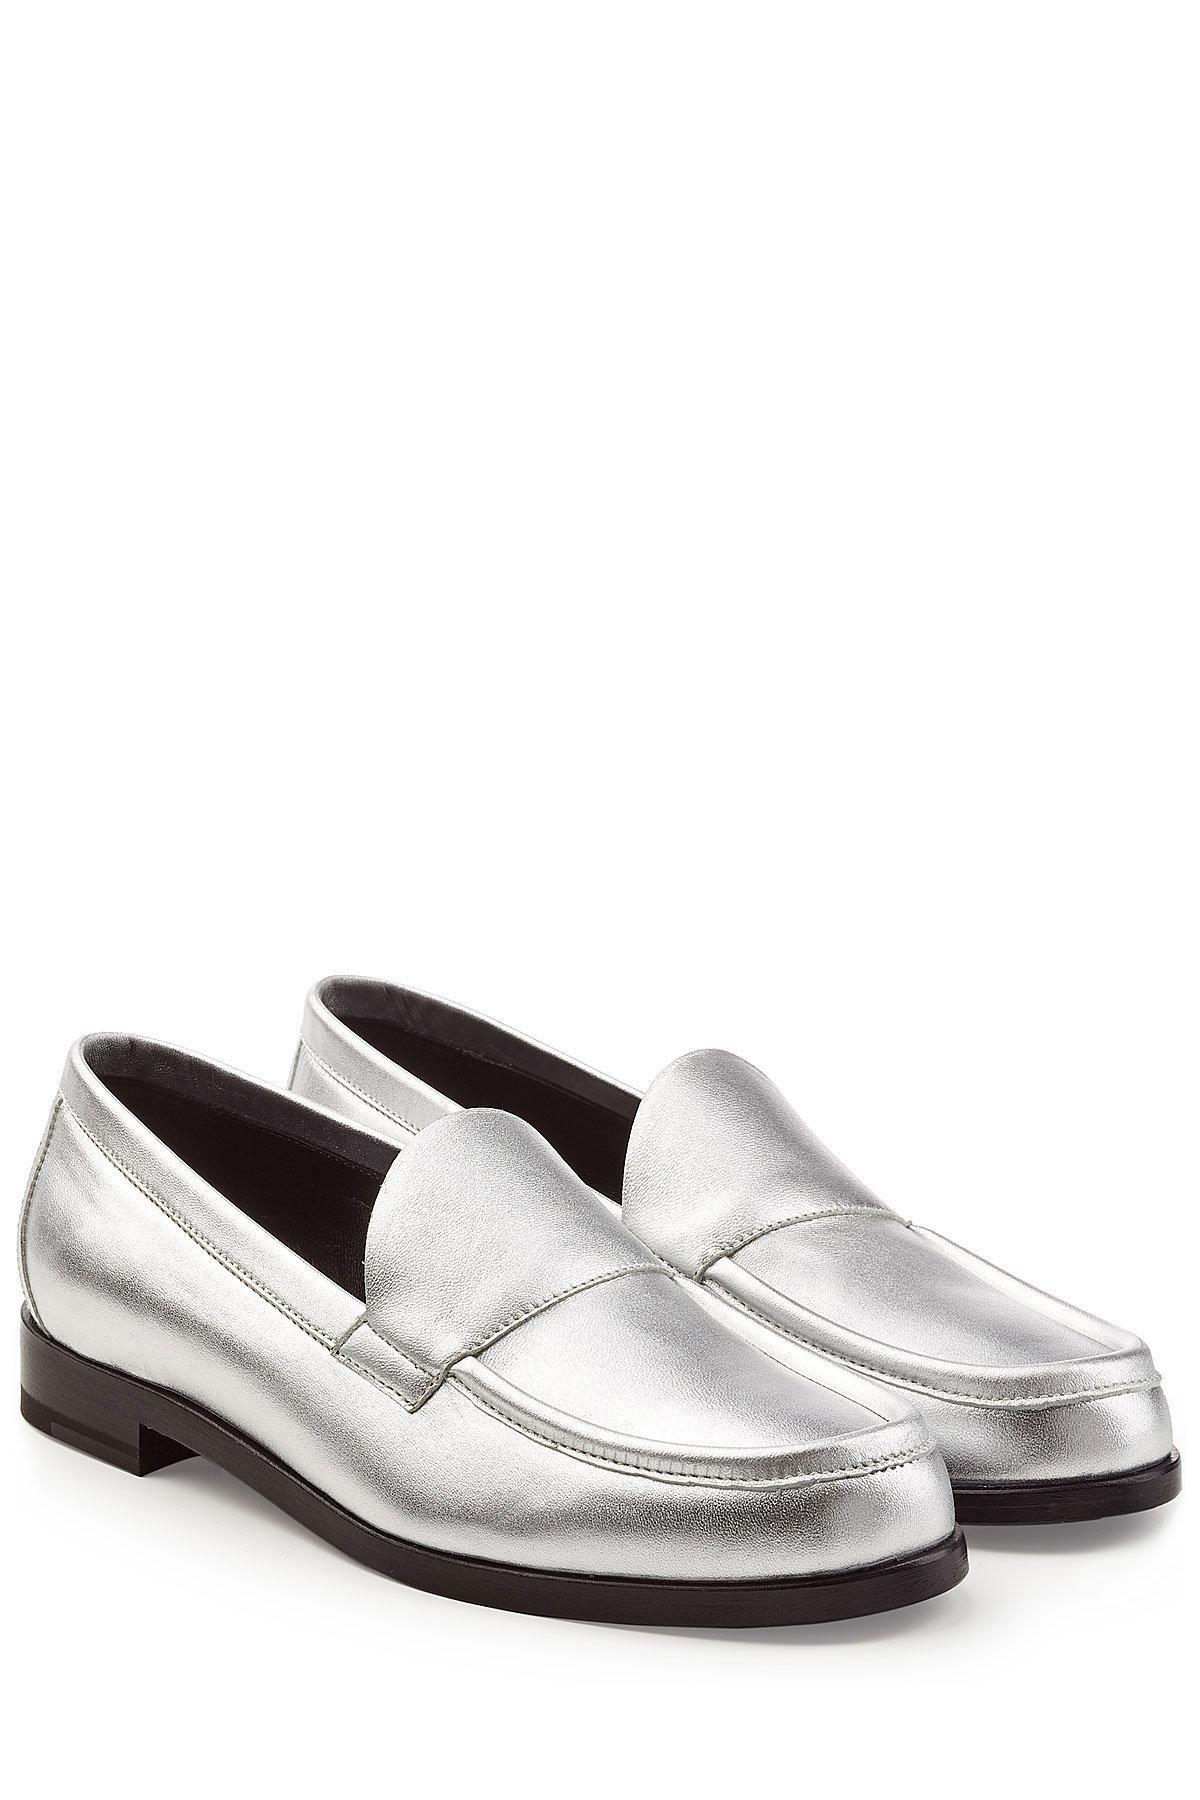 52c22f3a038 Pierre Hardy. Women s Metallic Leather Loafers